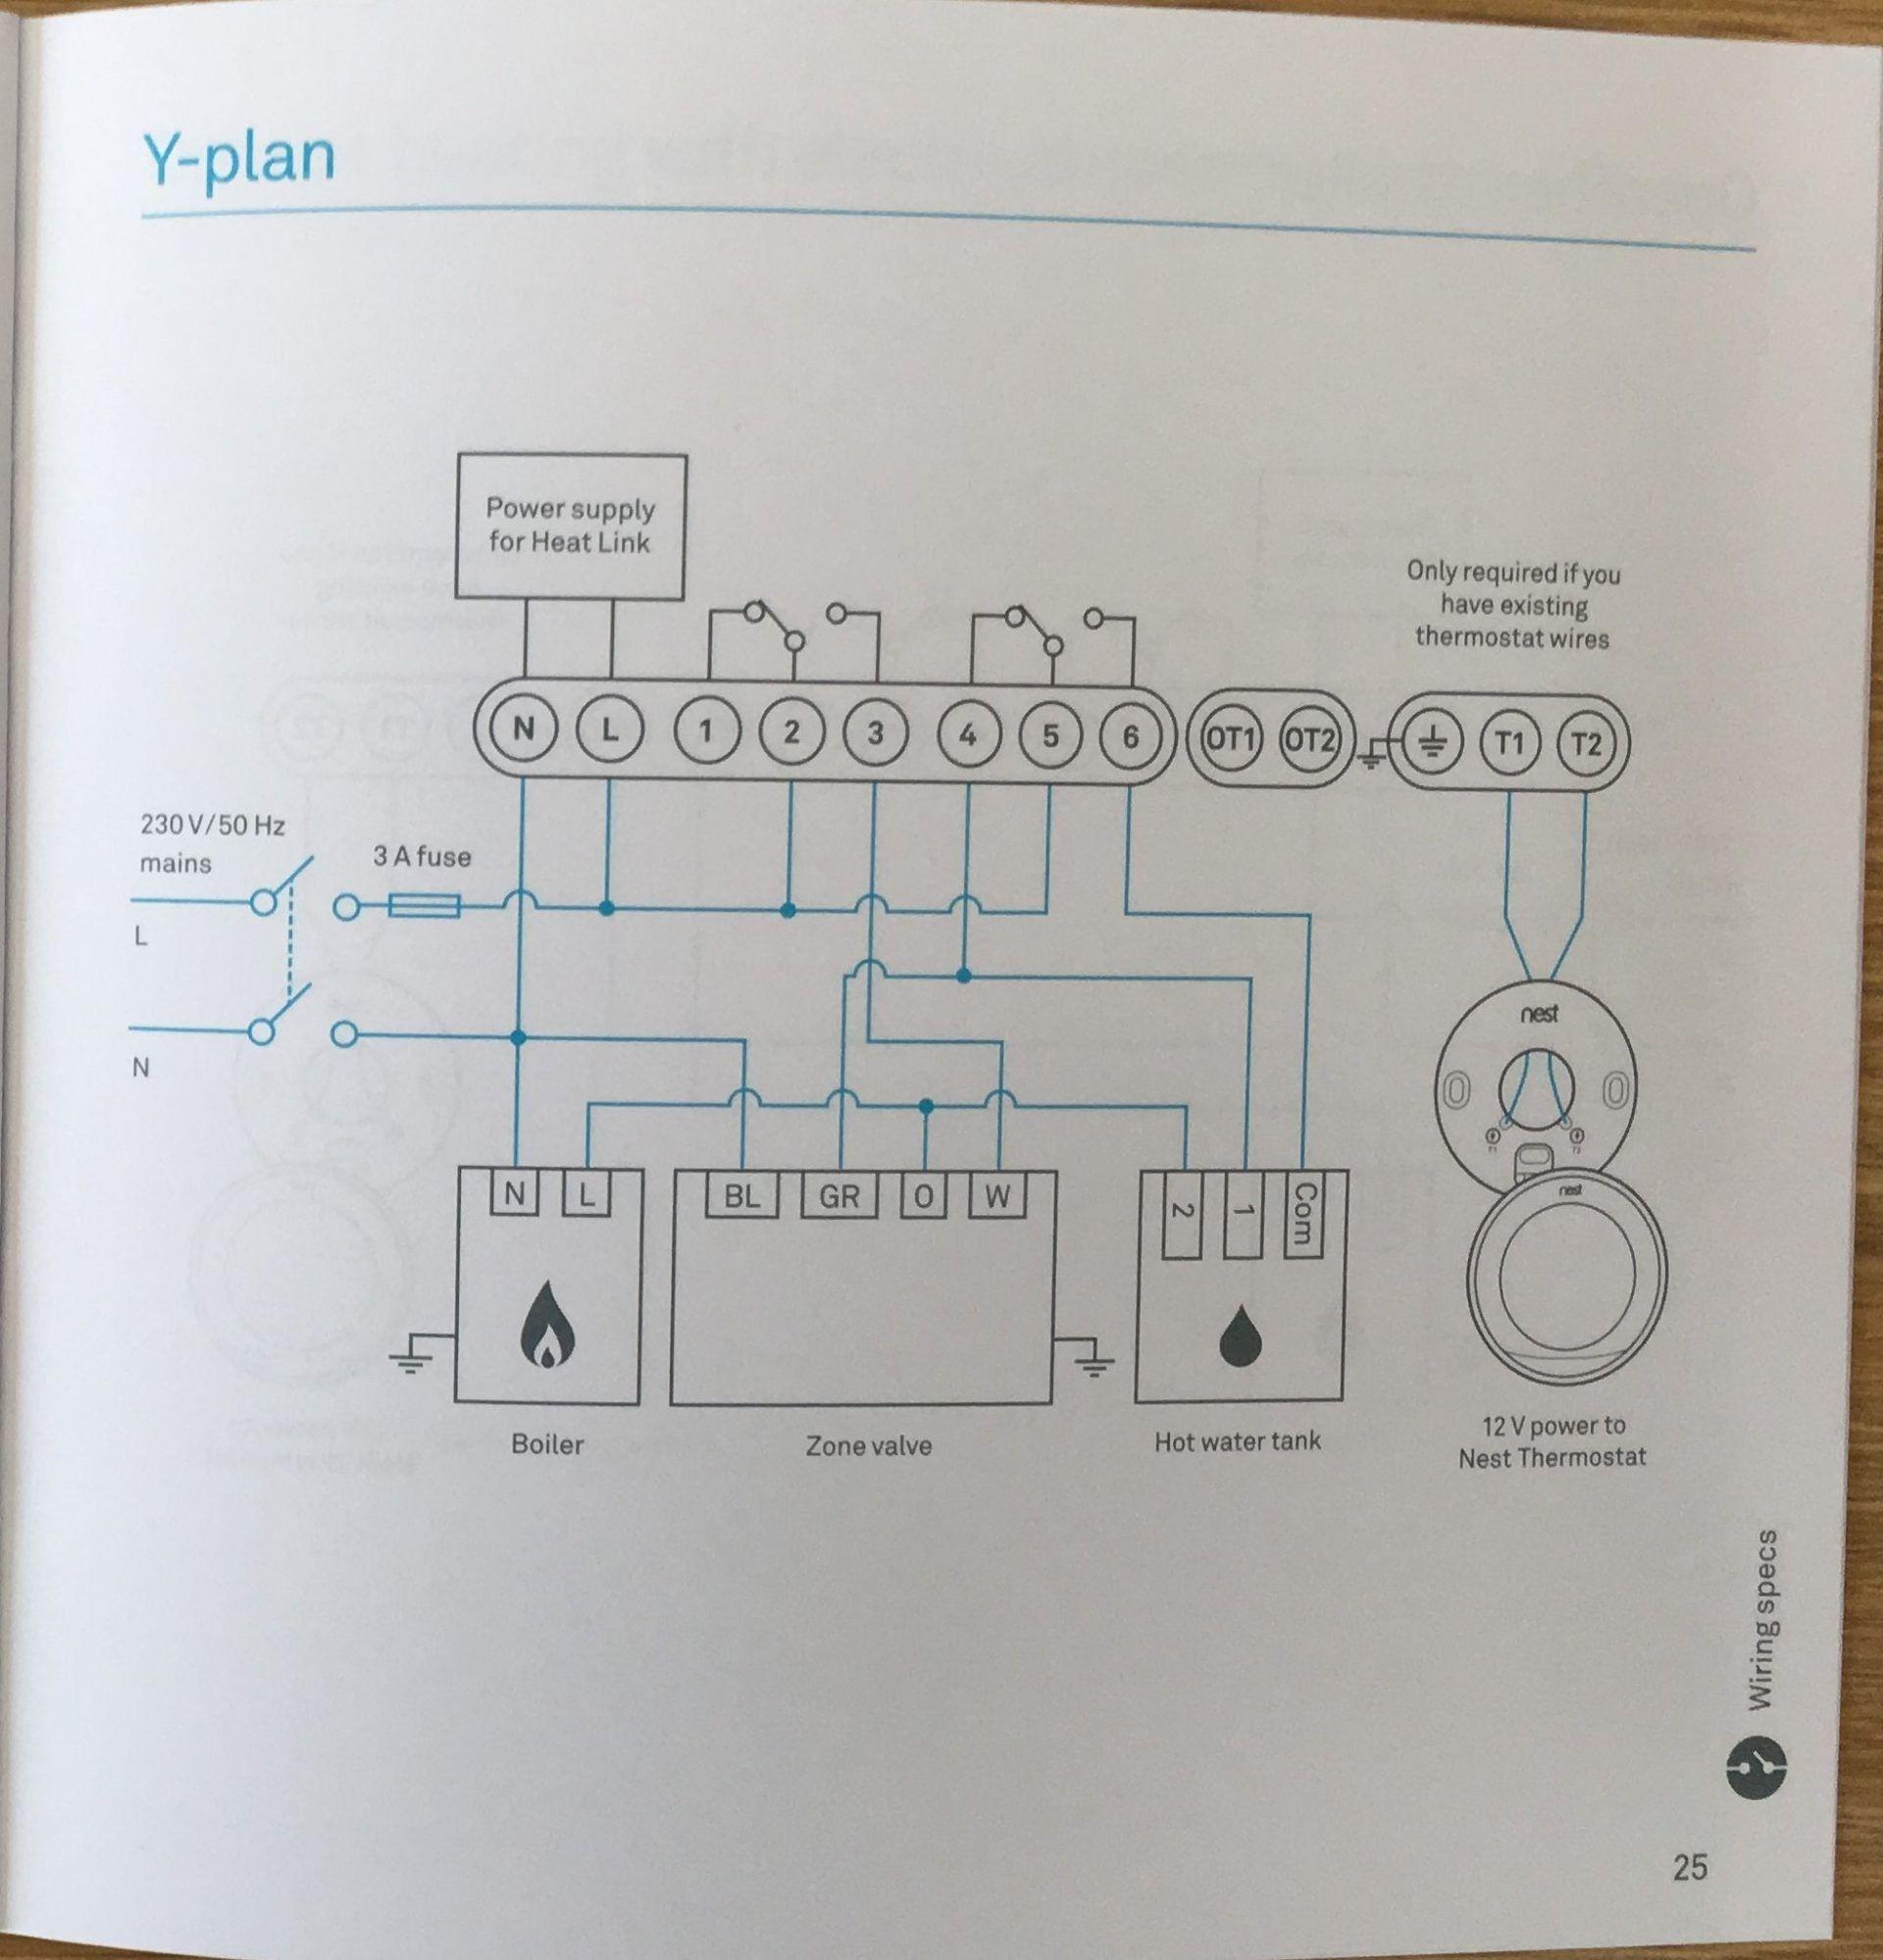 luxury wiring diagram for a y plan heating system diagrams digramssample diagramimages wiringdiagramsample [ 1920 x 1999 Pixel ]